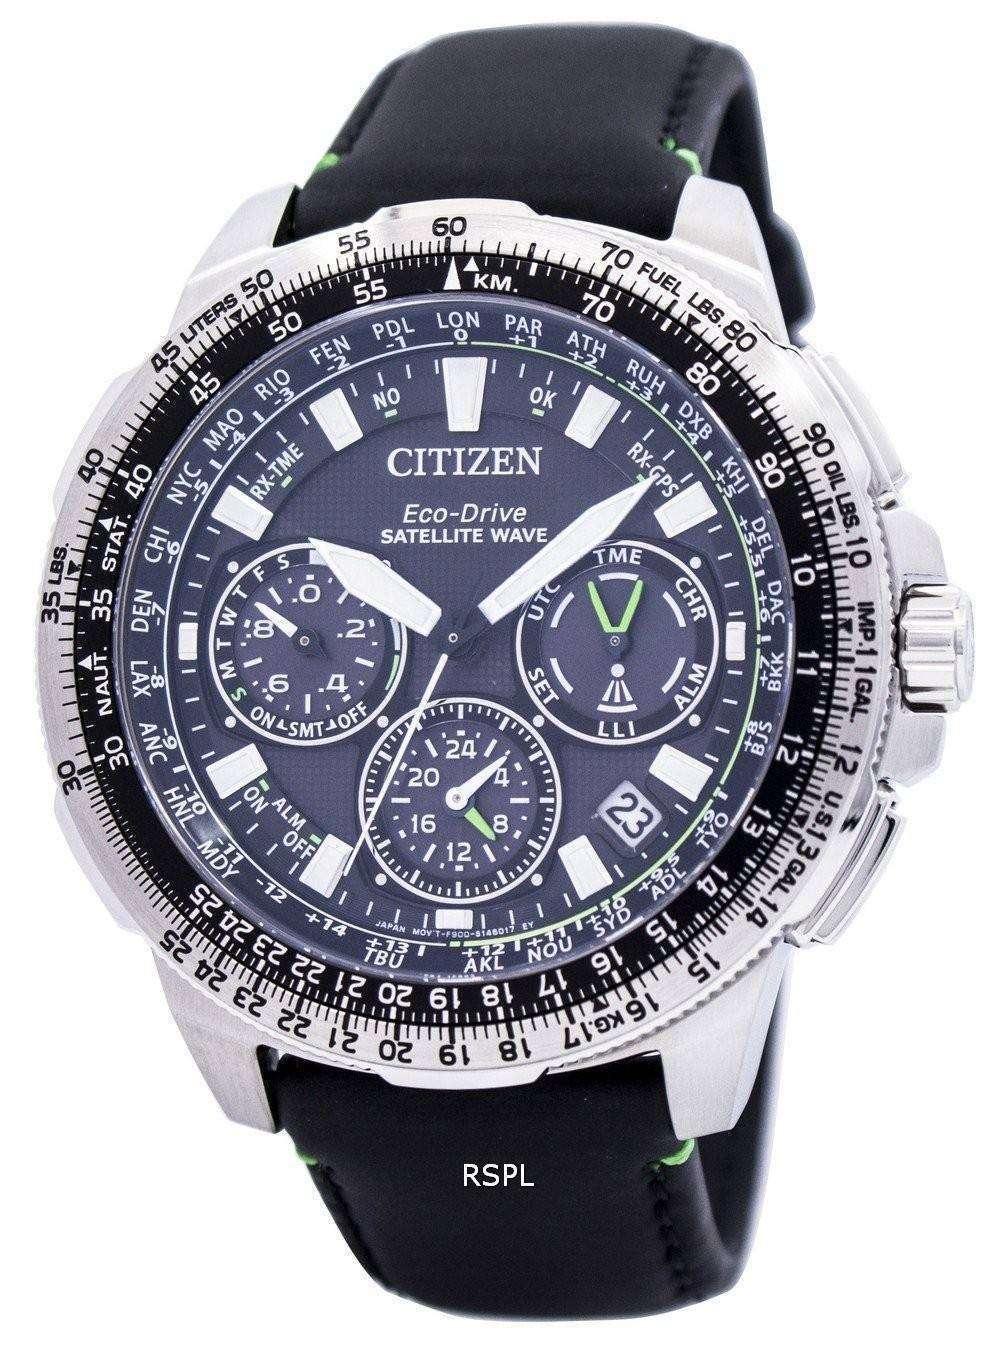 8677eb8d4a4 Citizen Eco-Drive Satellite Wave Promaster Navihawk GPS CC9030-00E Mens  Watch 1 ...